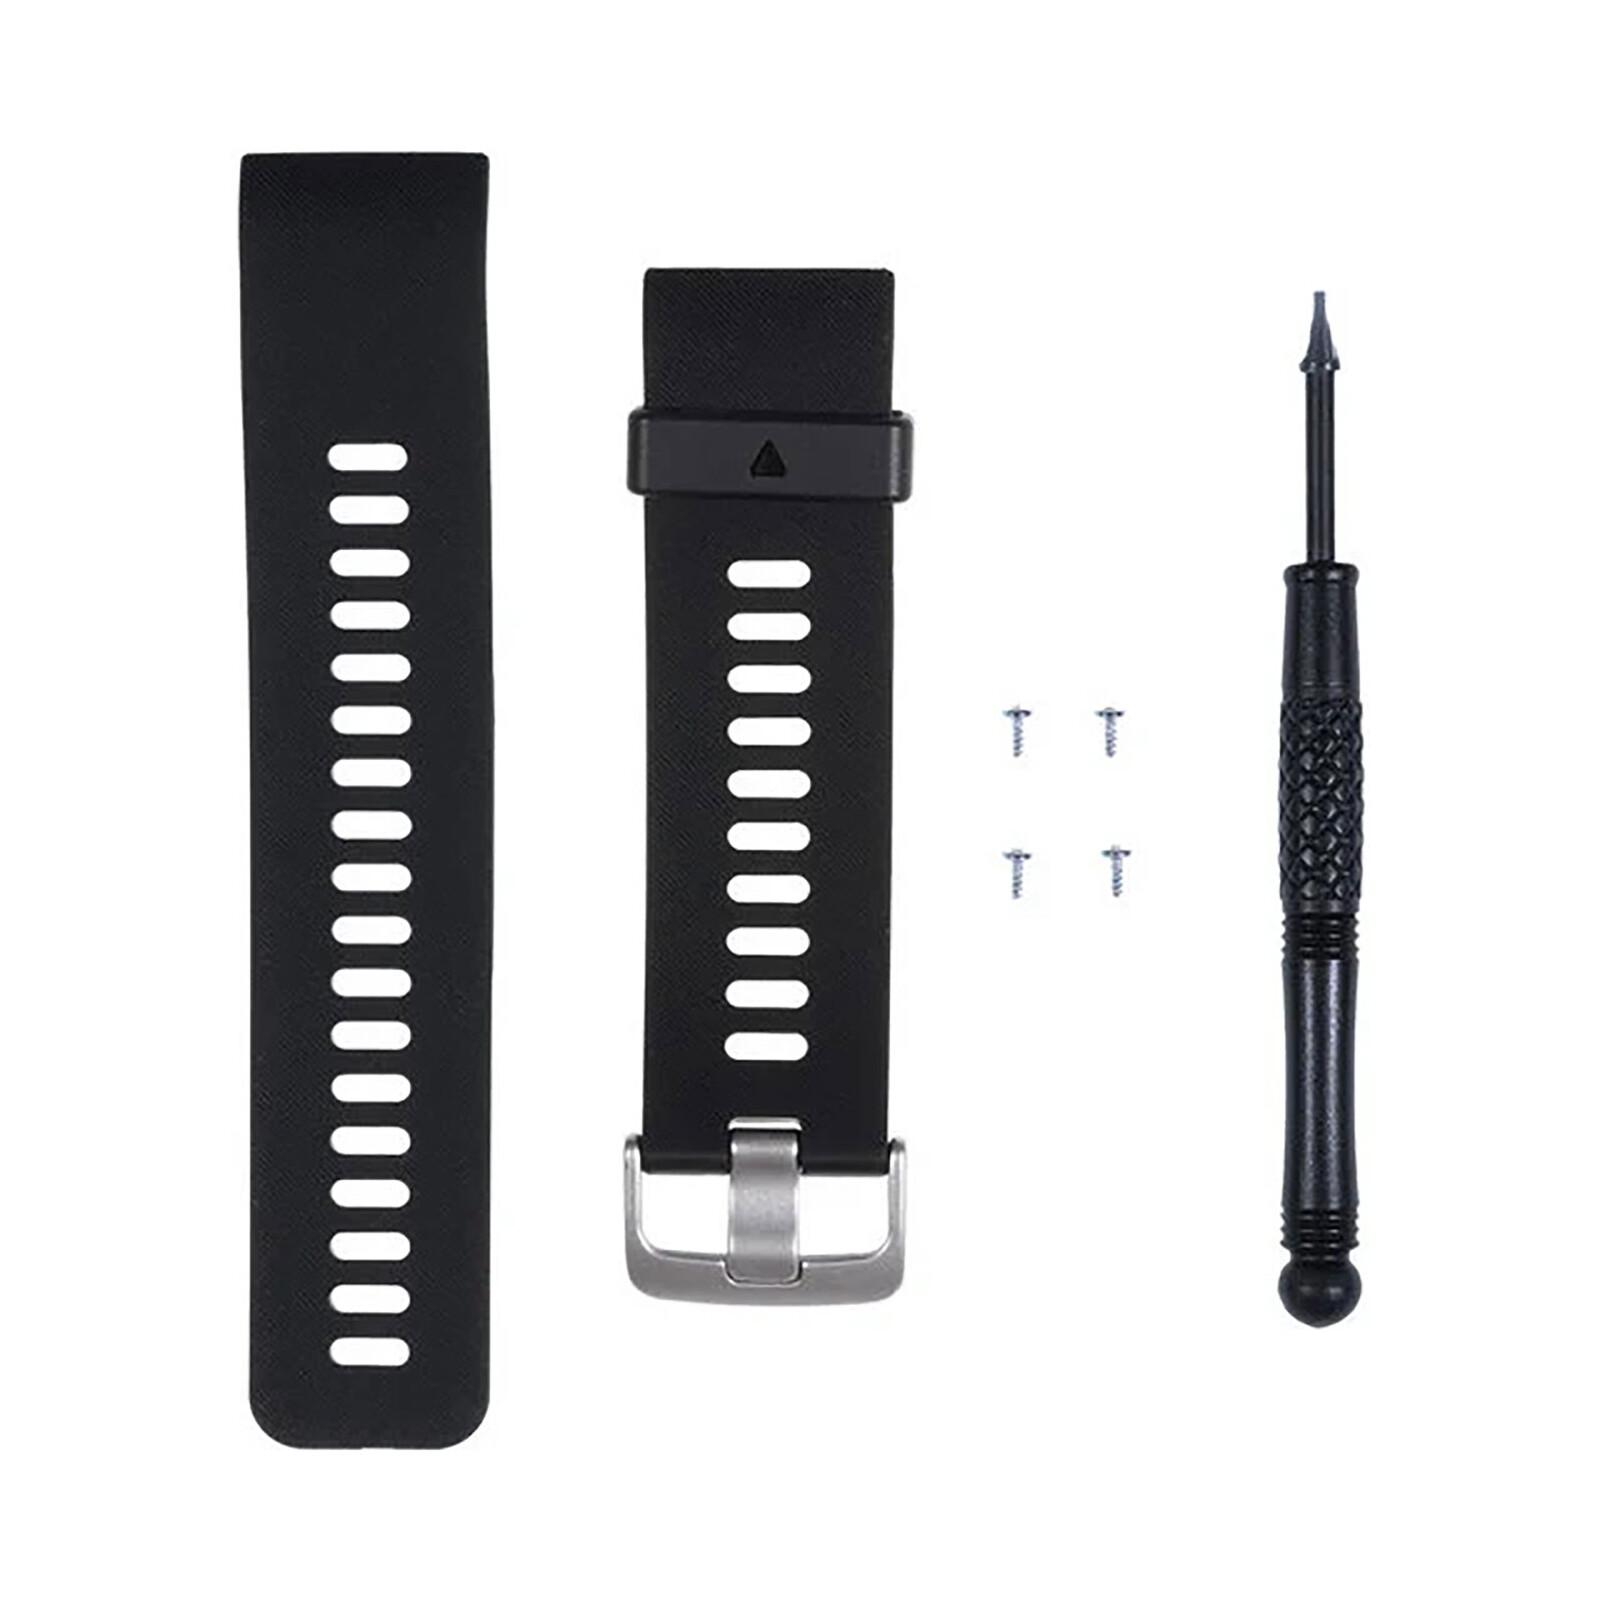 Garmin Forerunner 35 Armbandkits Black